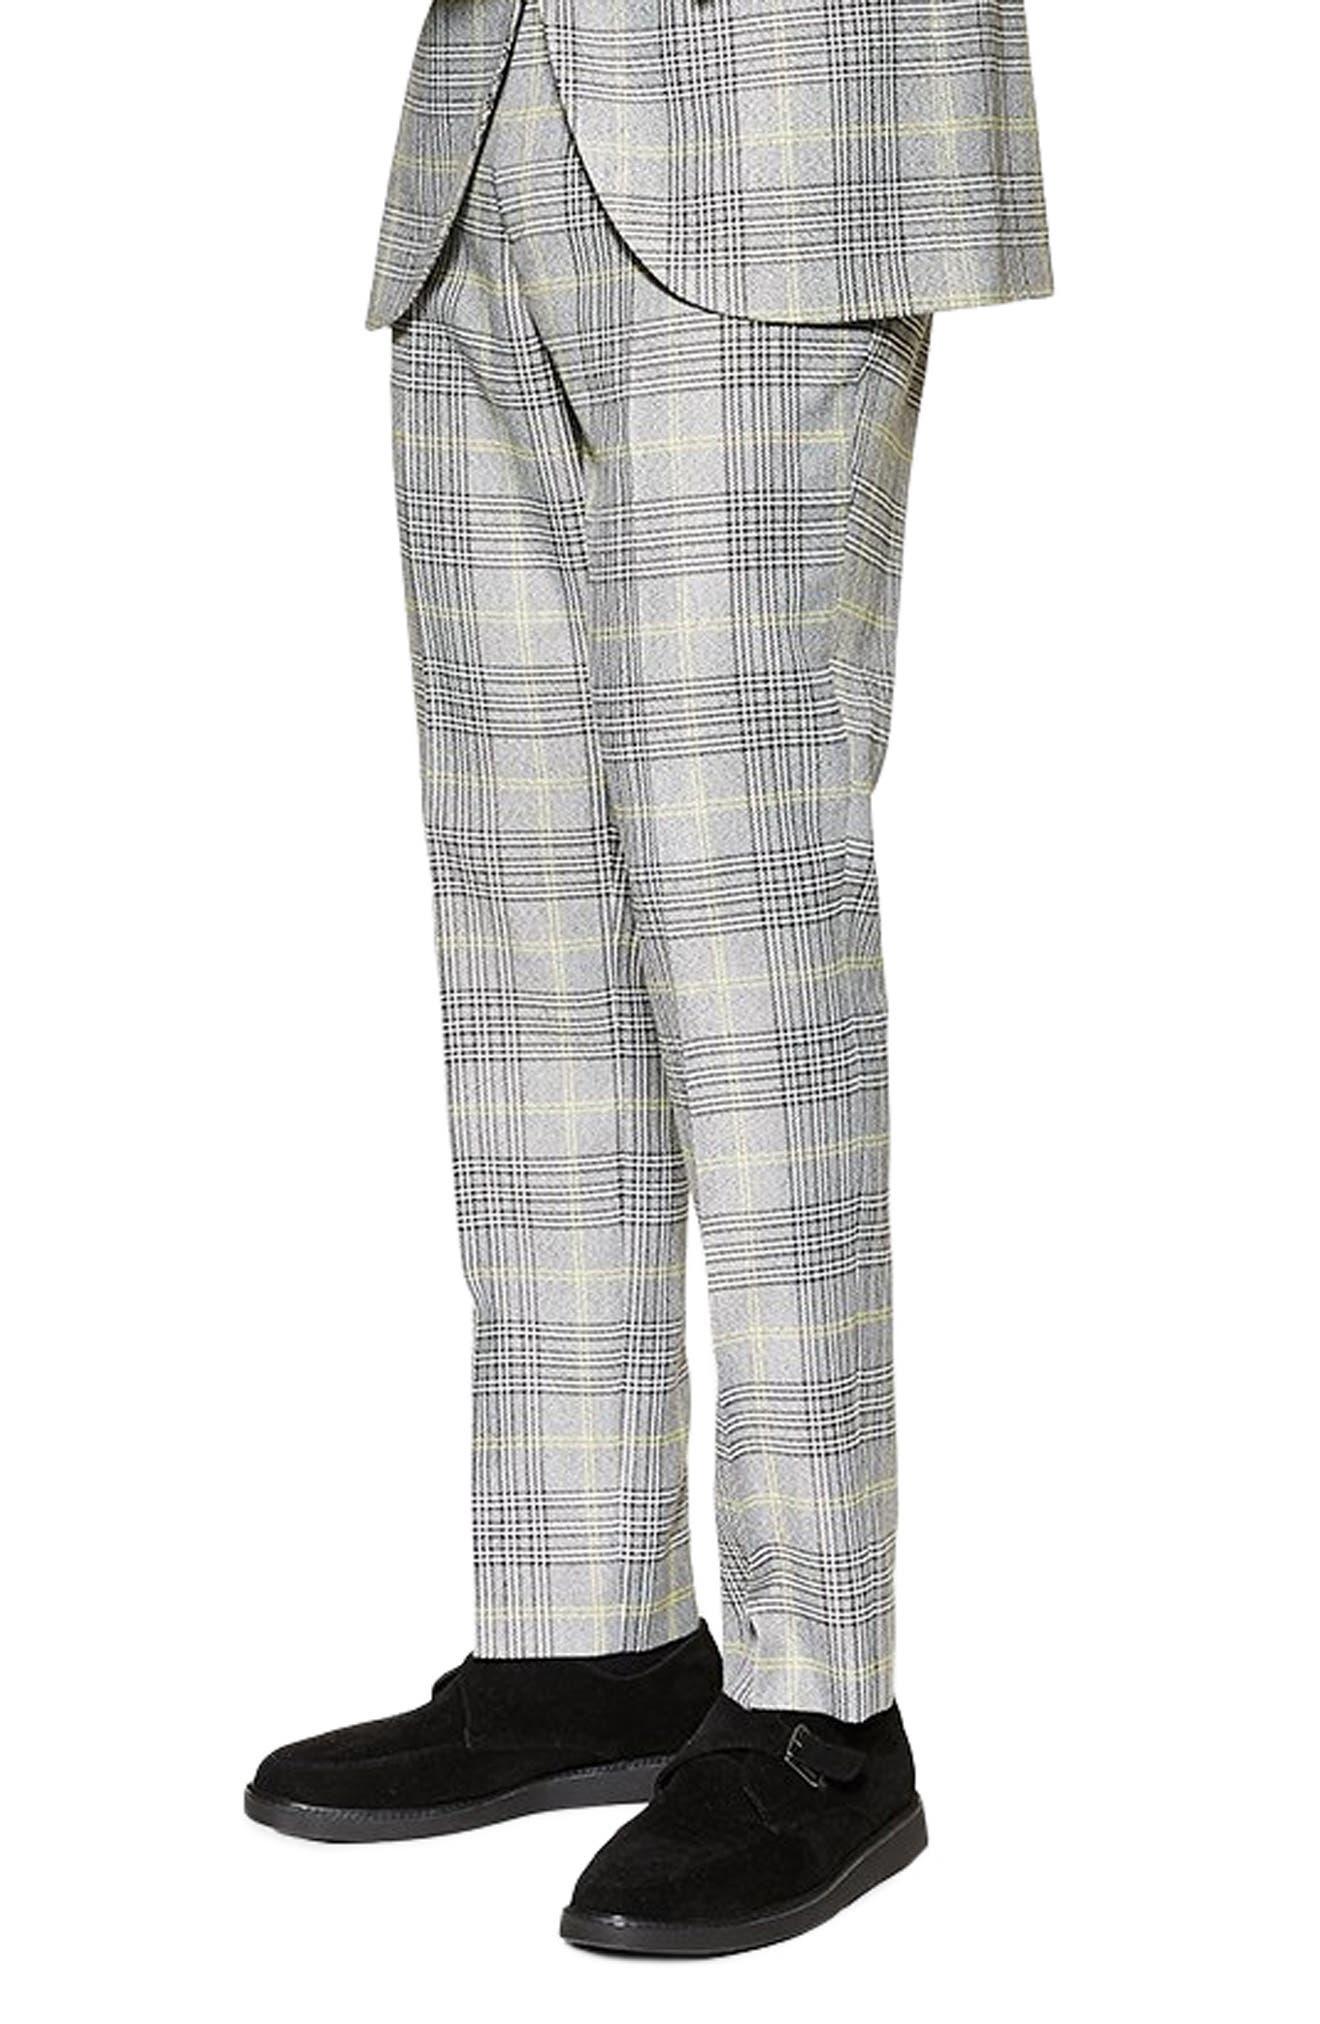 TOPMAN, Check Slim Trousers, Alternate thumbnail 3, color, GREY